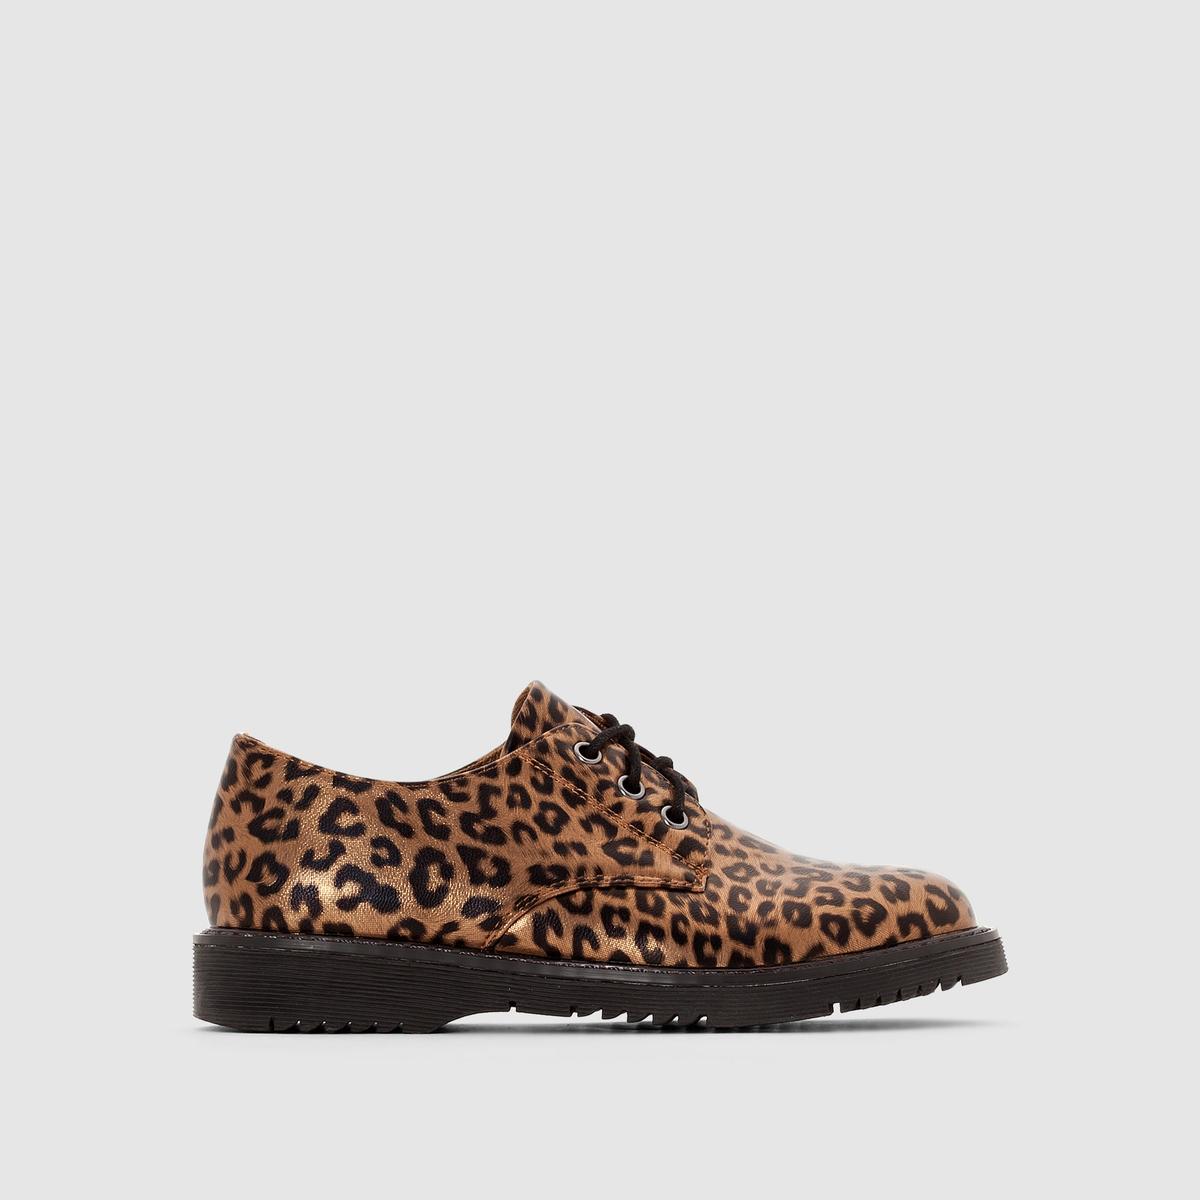 Ботинки-дерби с леопардовым рисунком от La Redoute